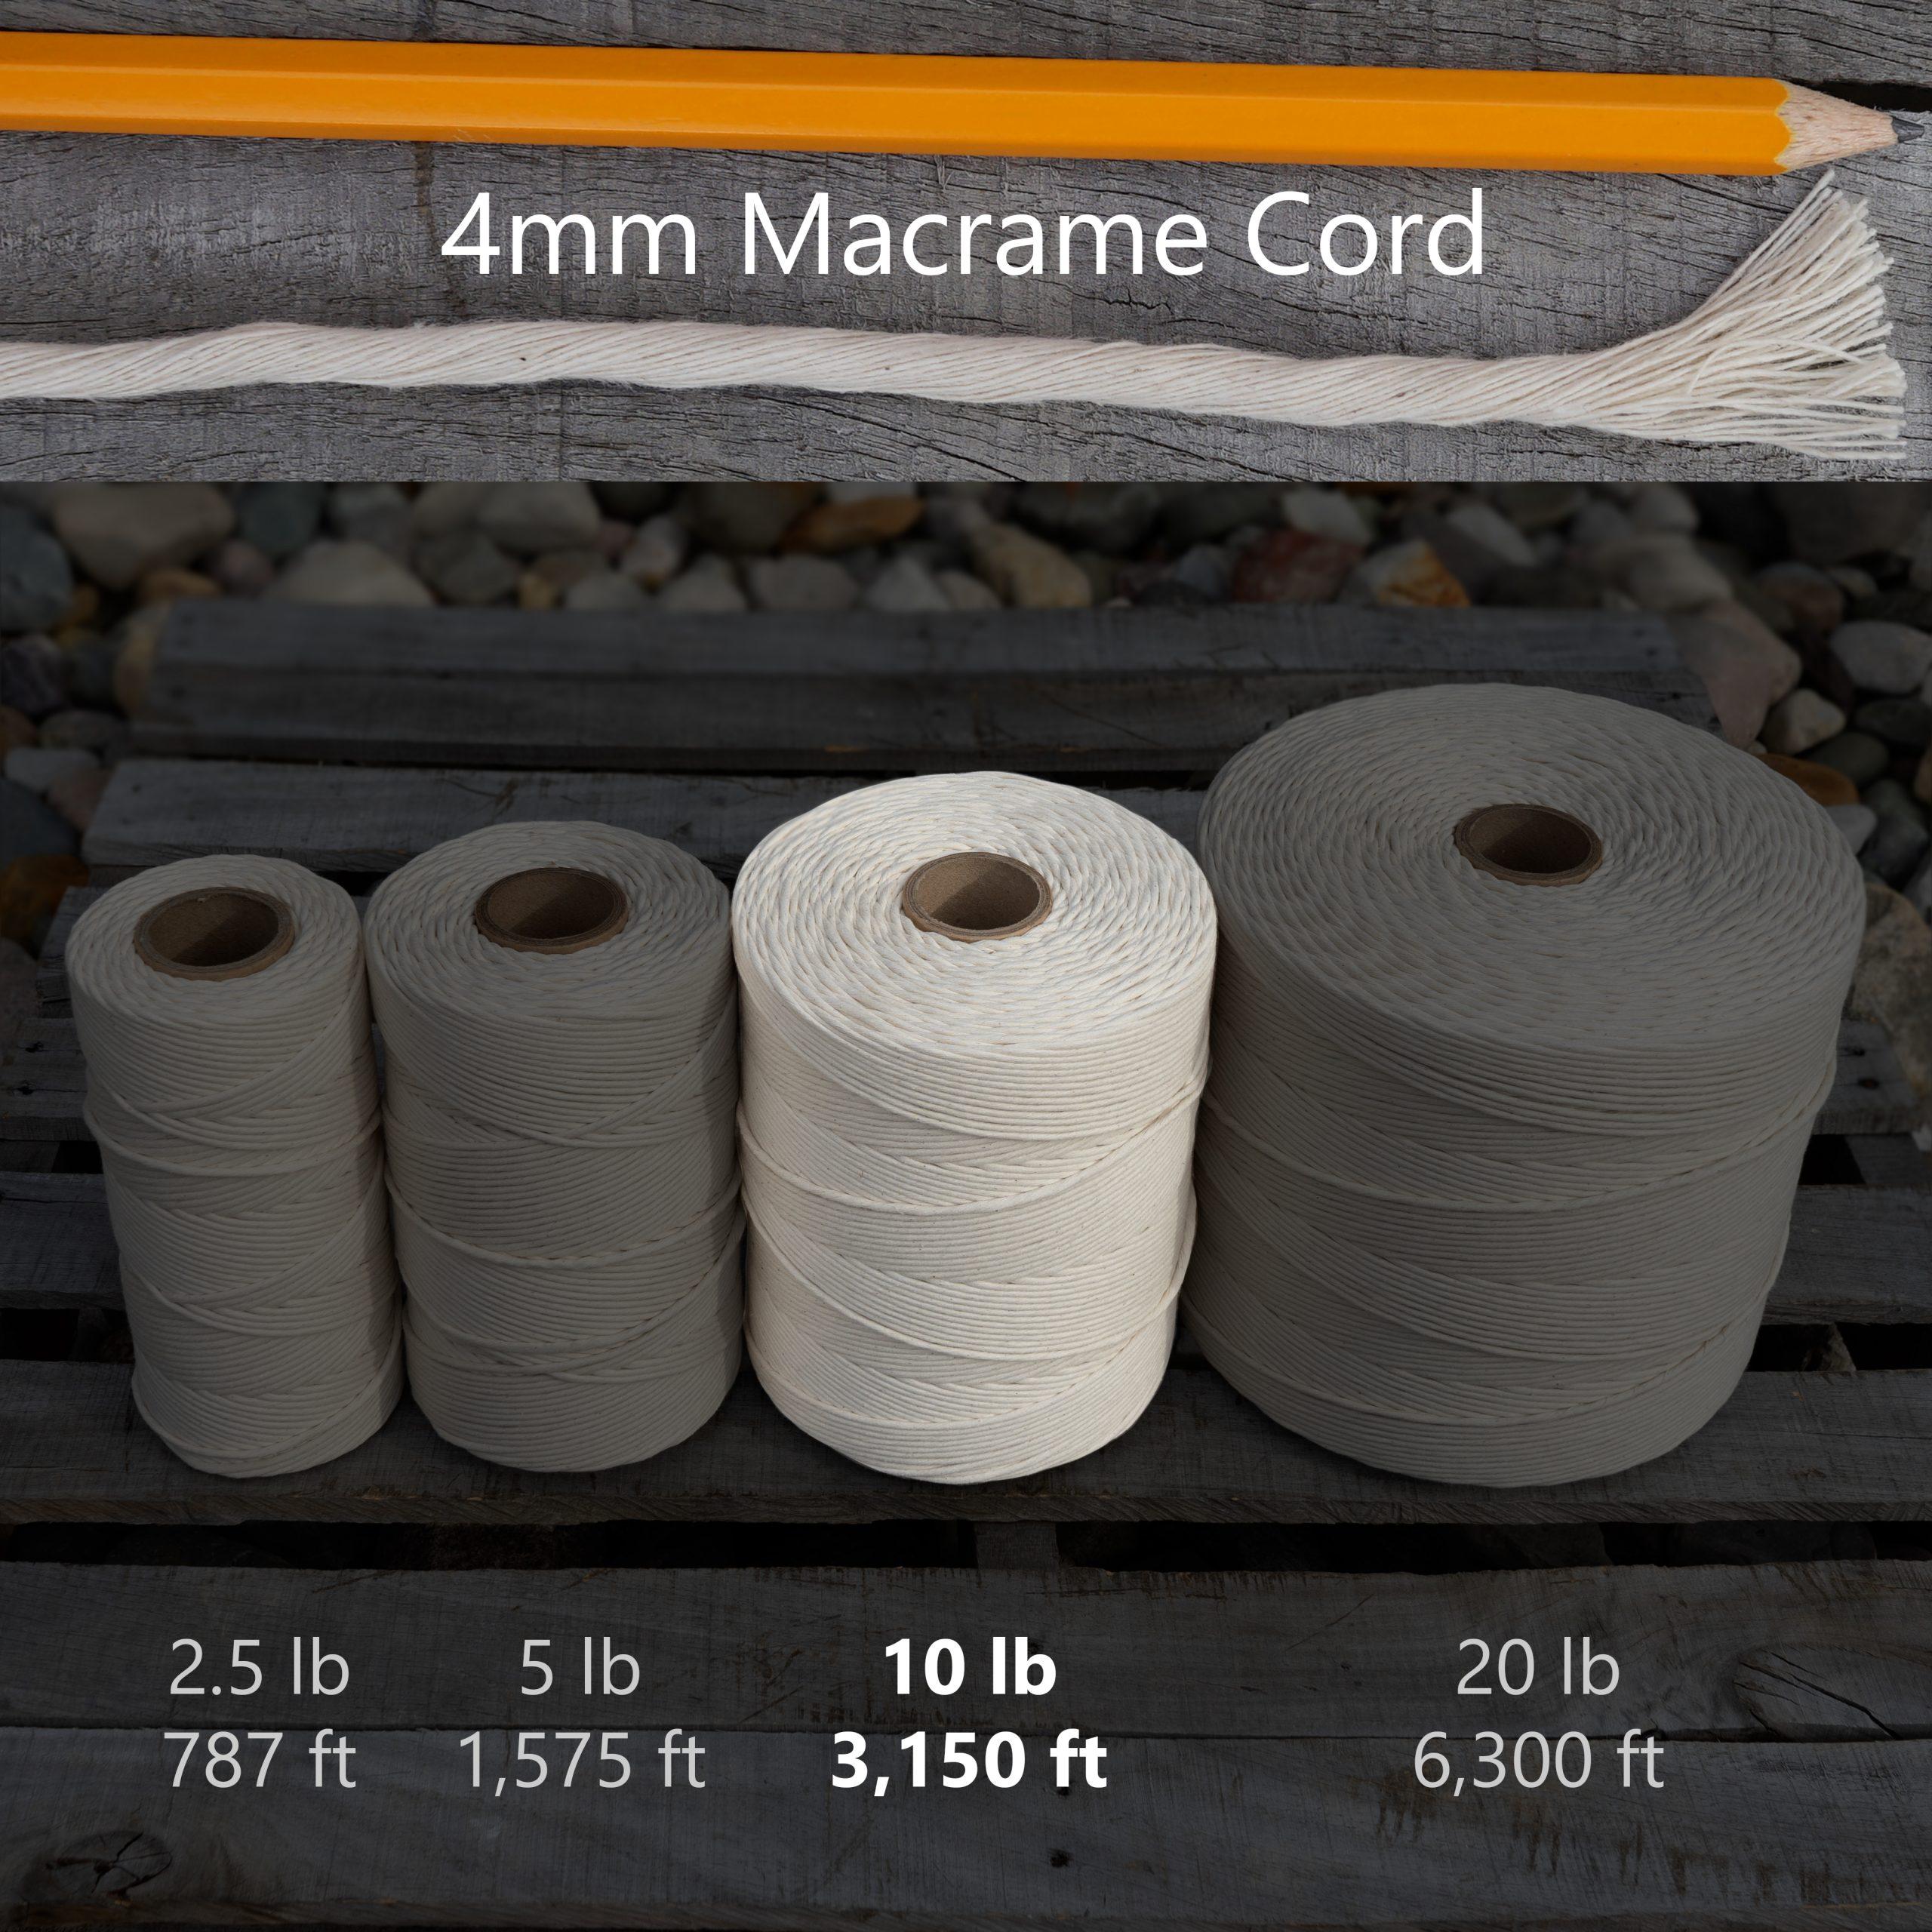 4 mm x 10 lb macrame tube